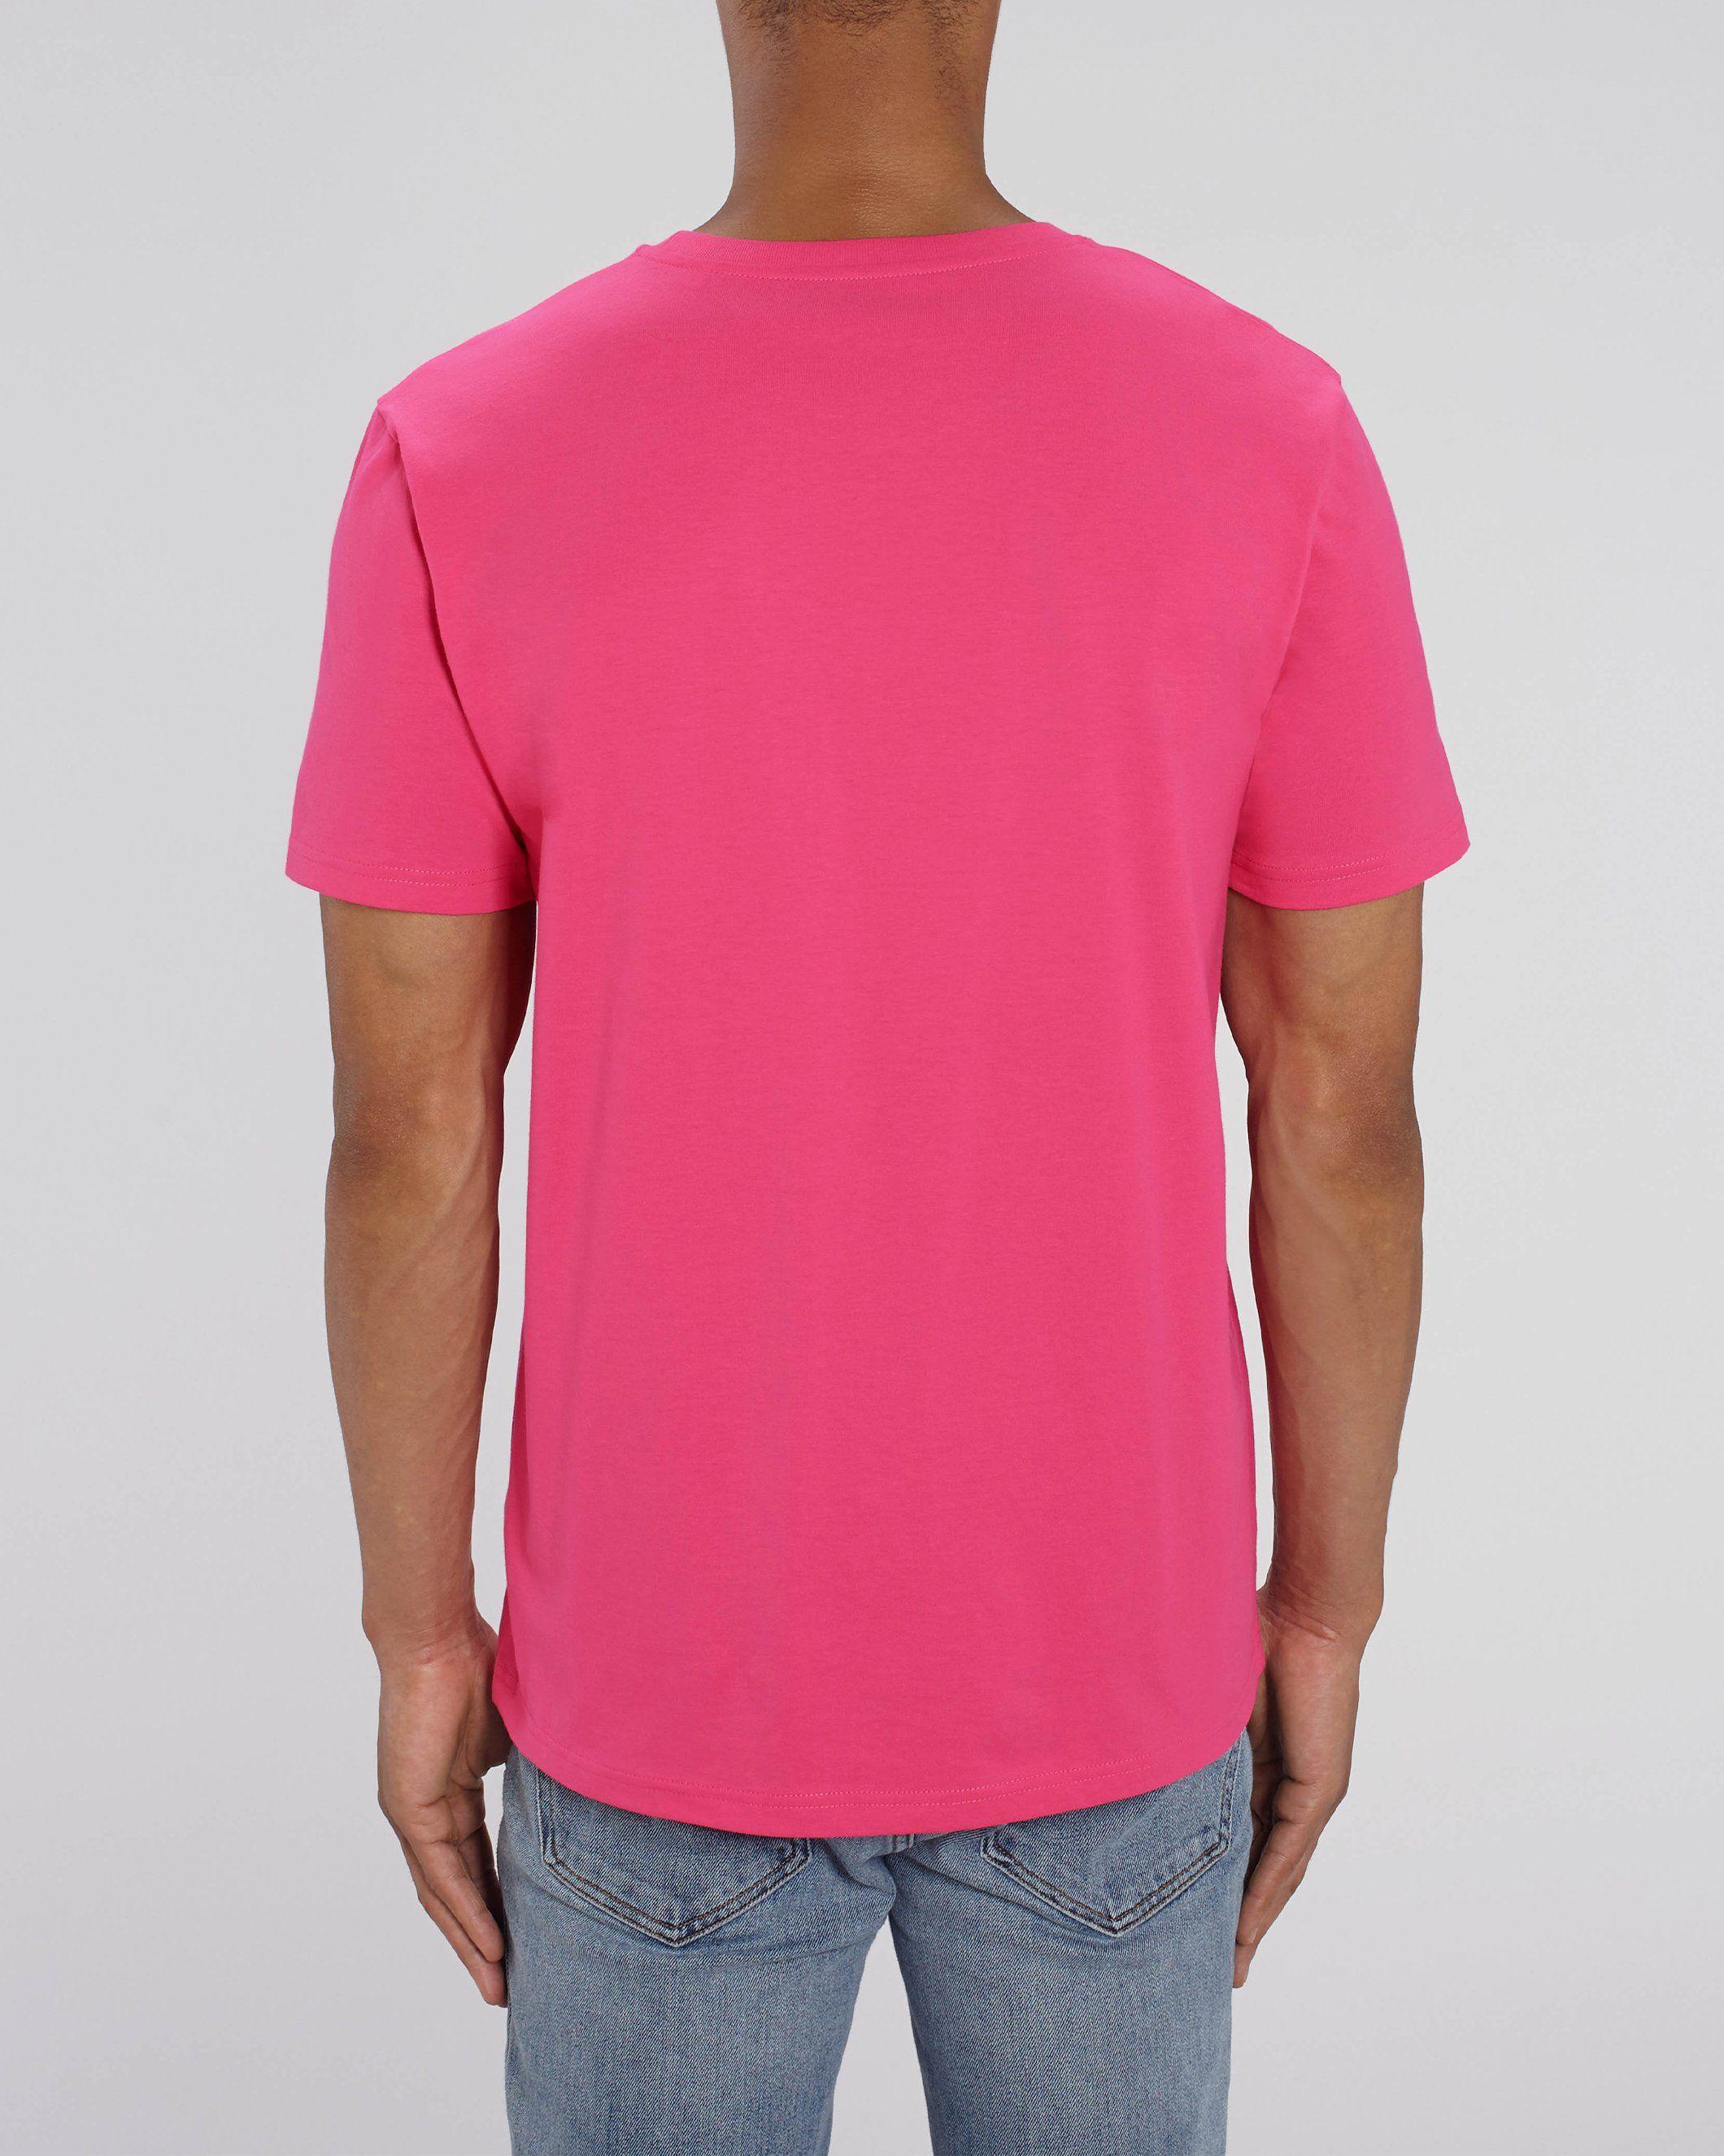 Nauli Unisex Regular Fit T-Shirt in Pink